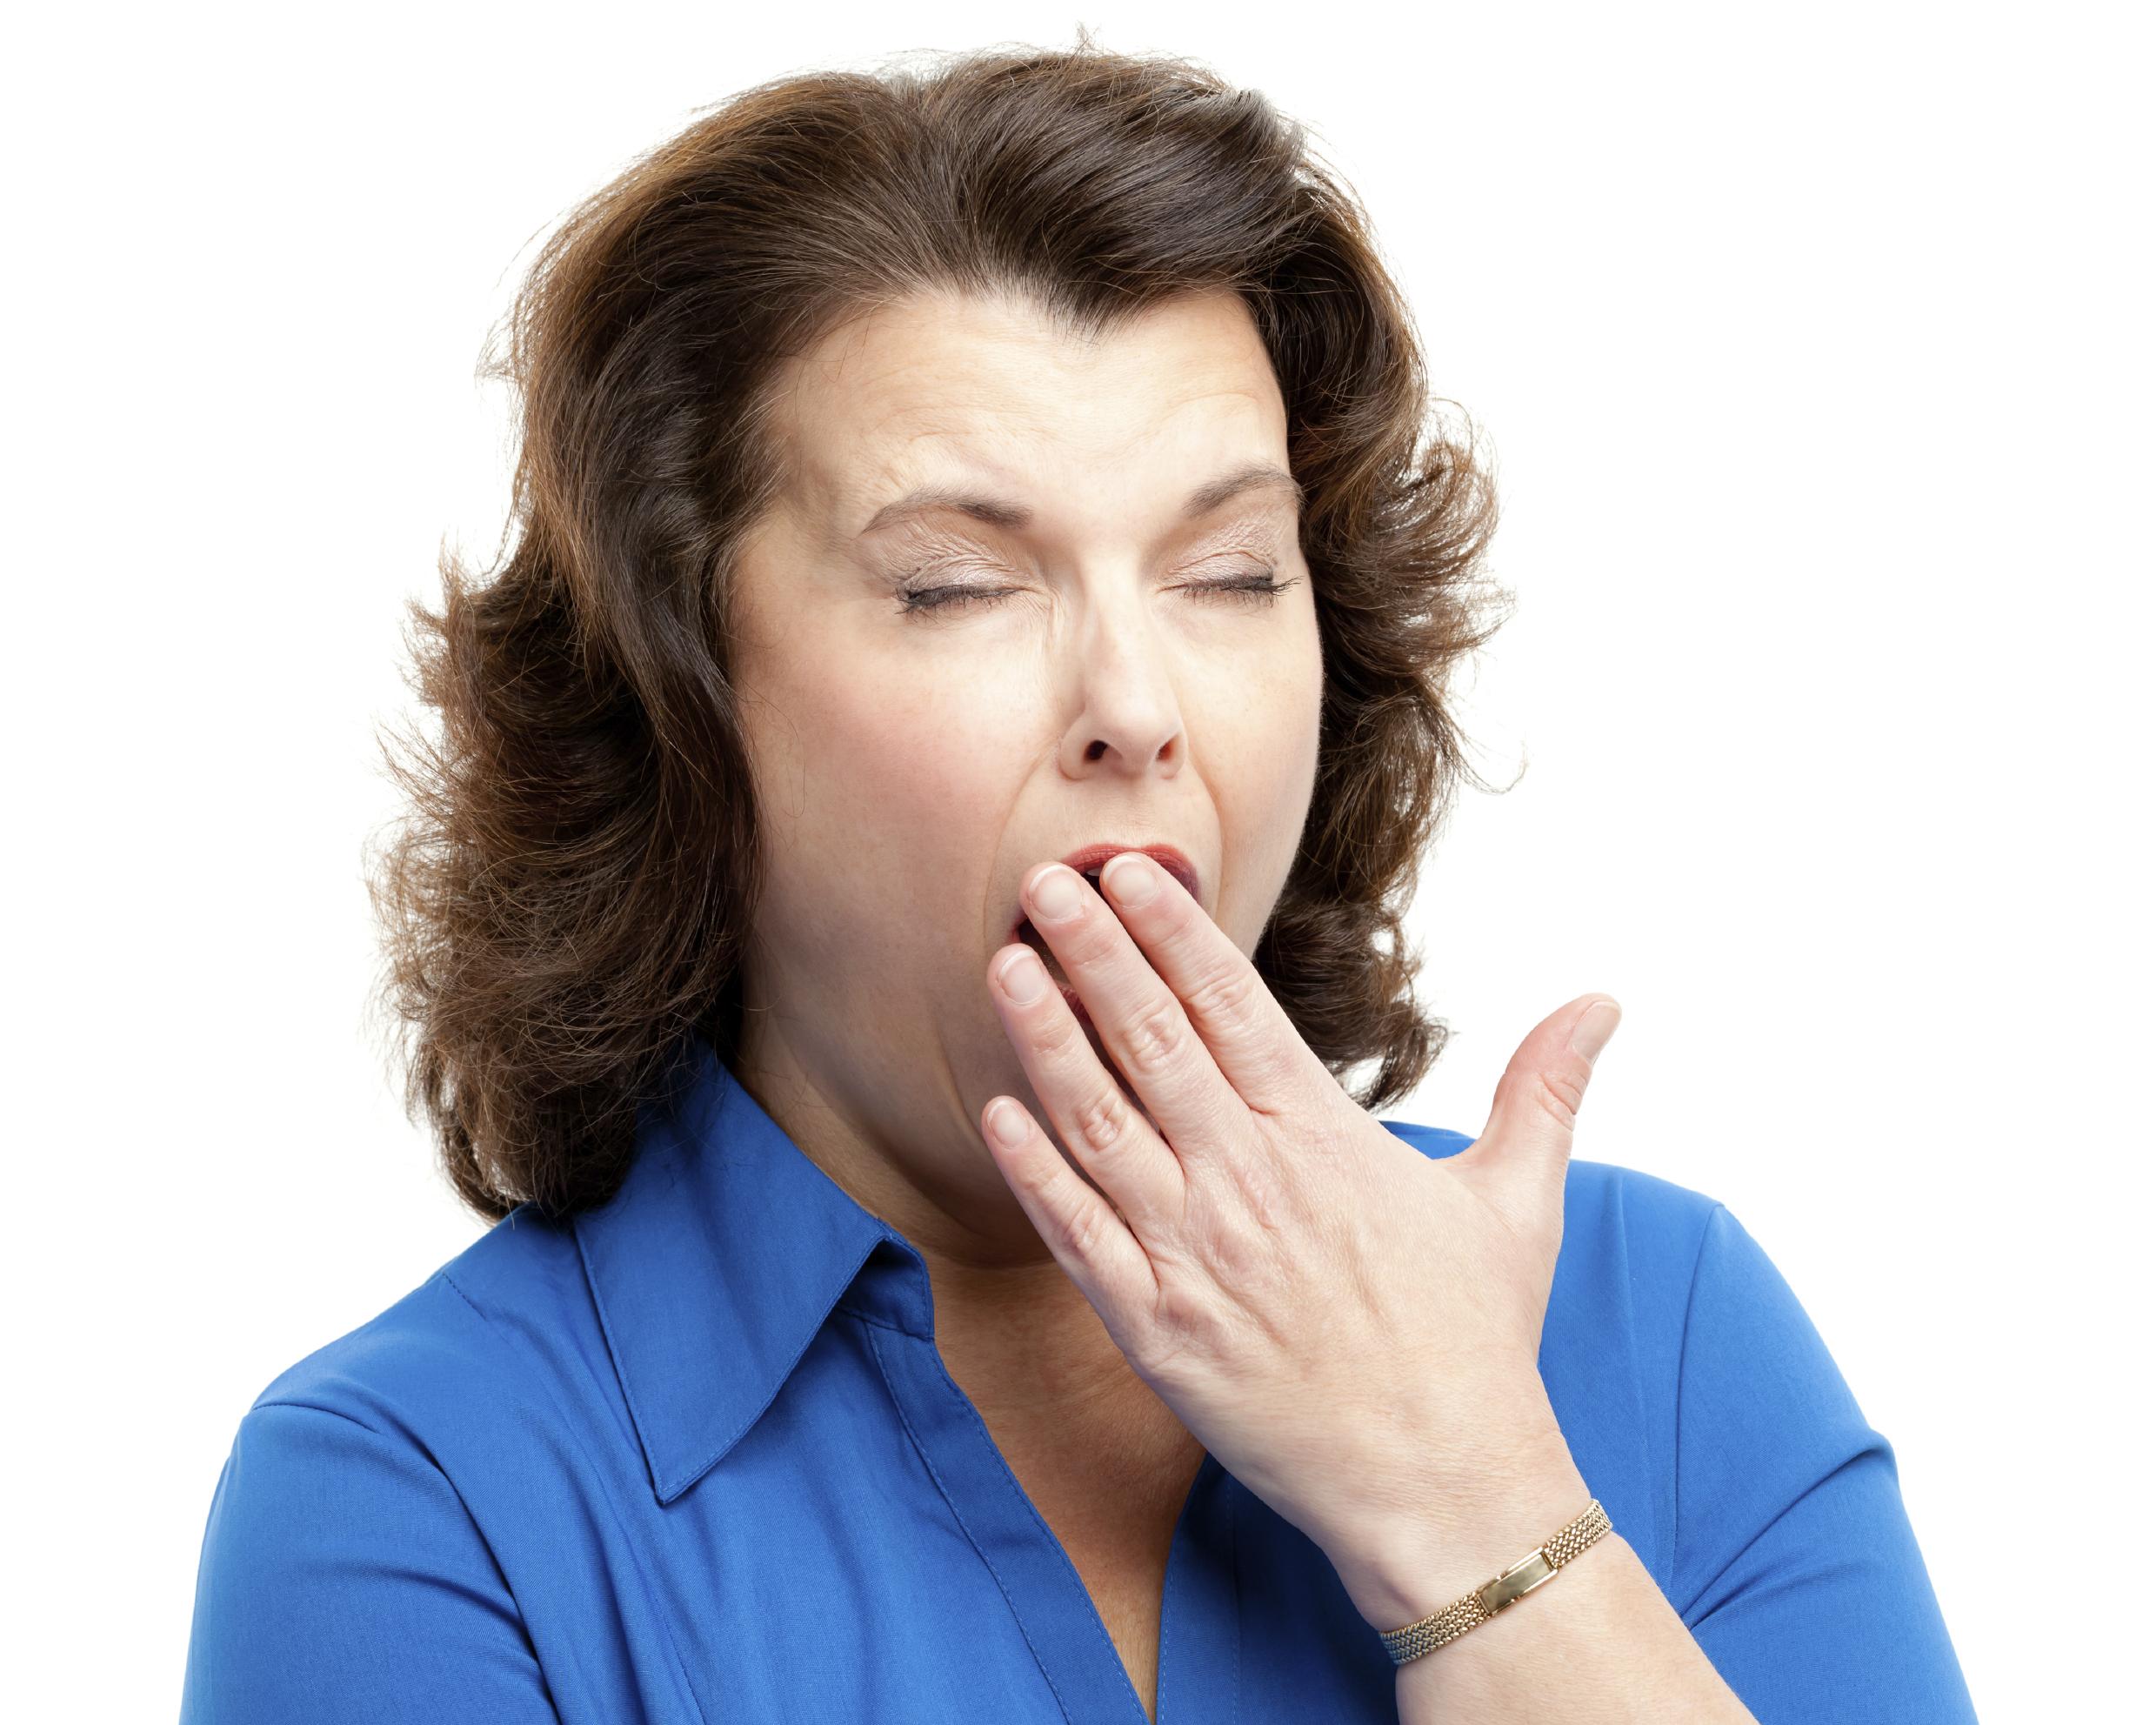 """No Sweat Public Speaking!"" Bored Lady"